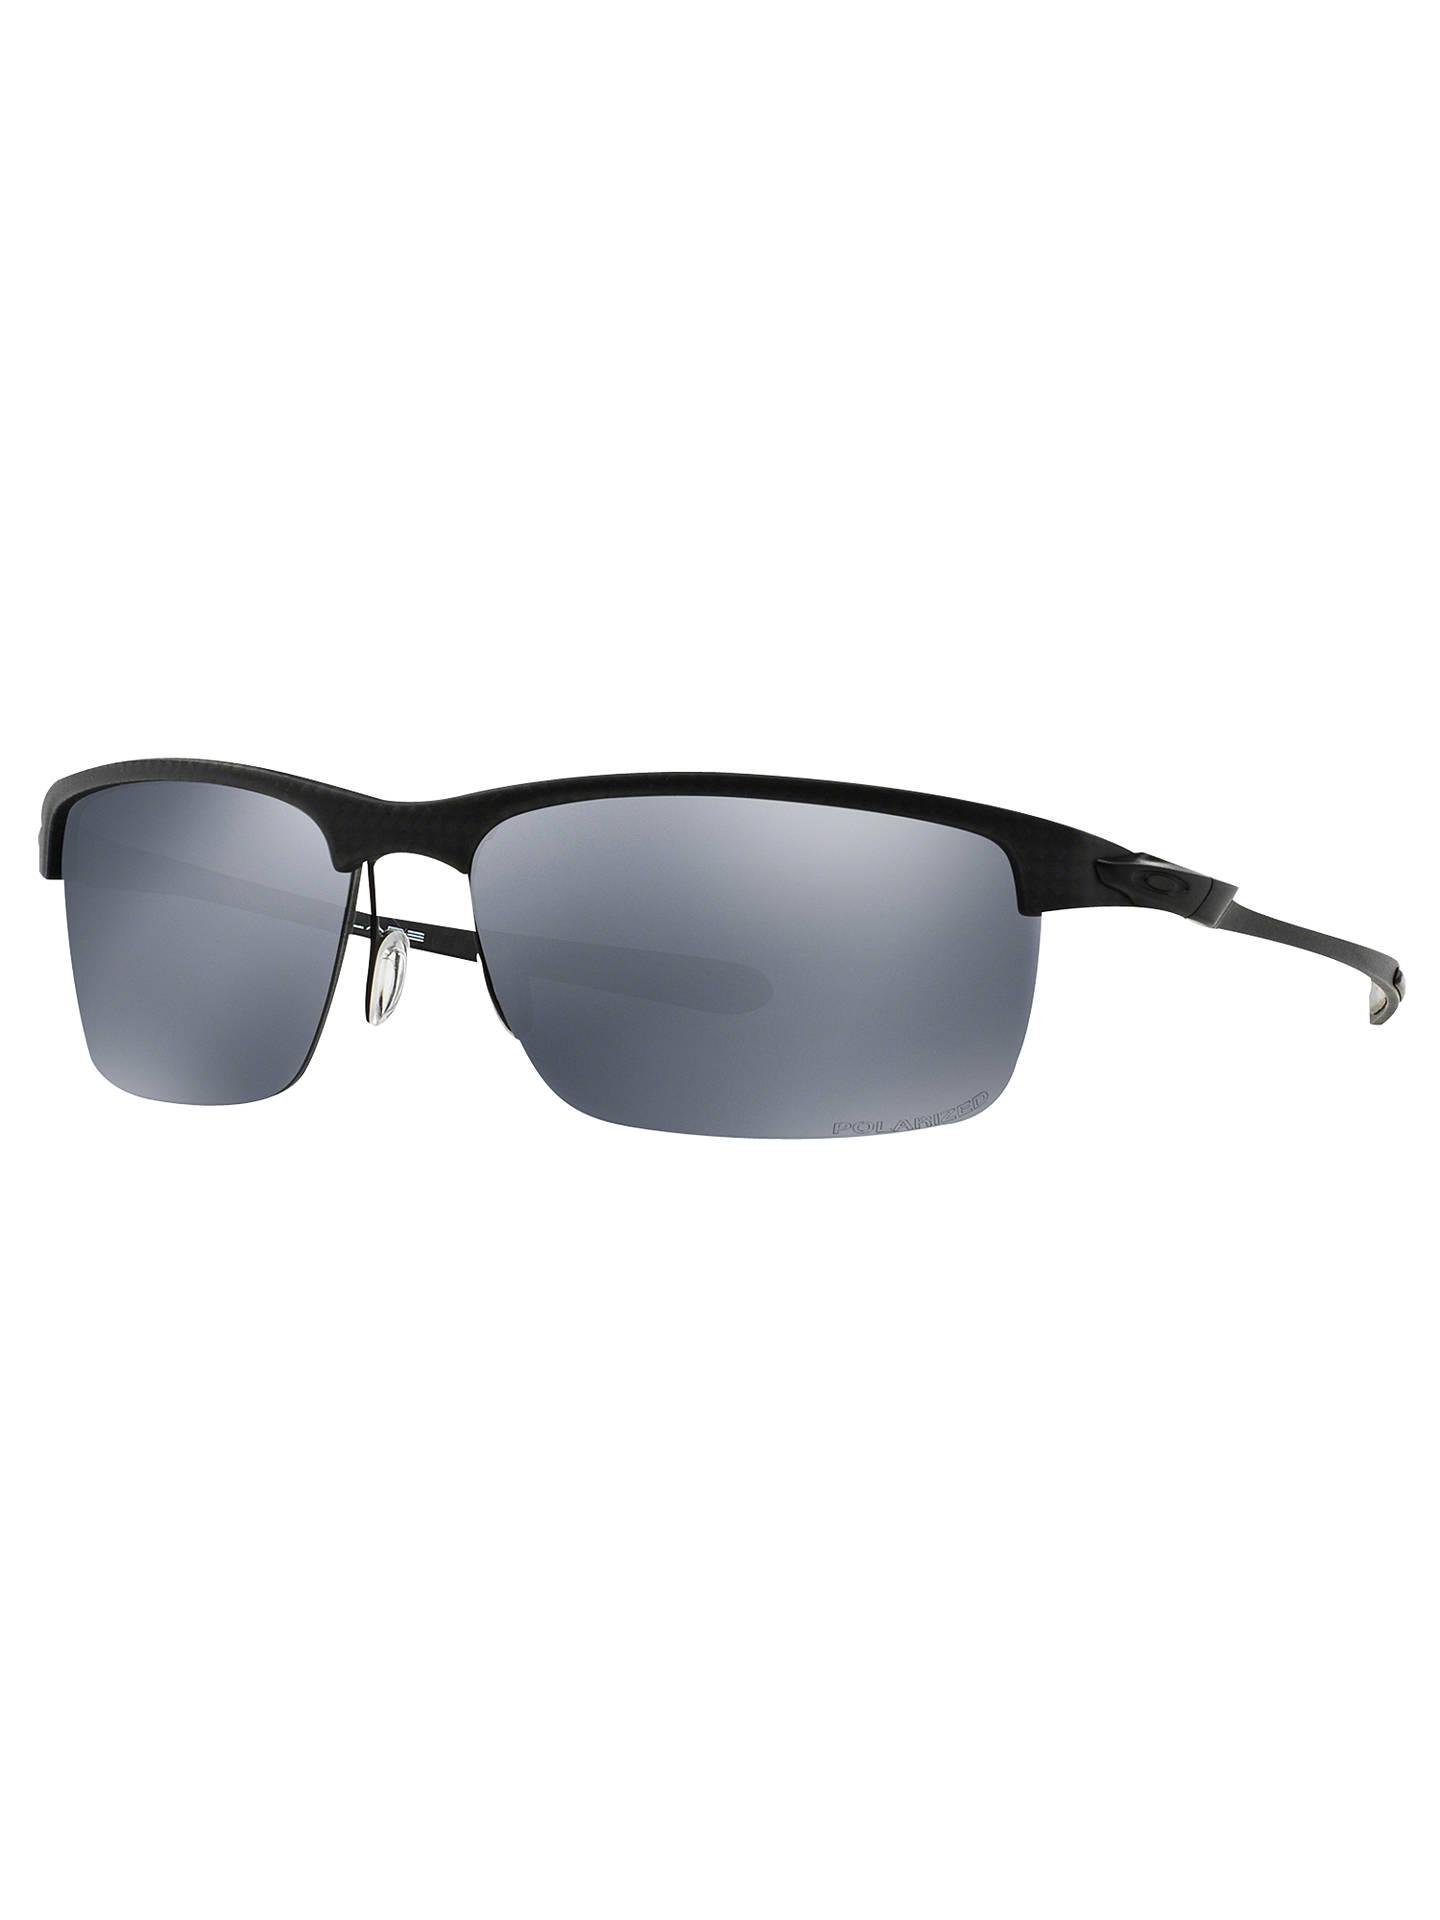 SunglassesBlackmirror Silver Oakley Carbon Oo9174 Polarised Blade QhdrtsxC